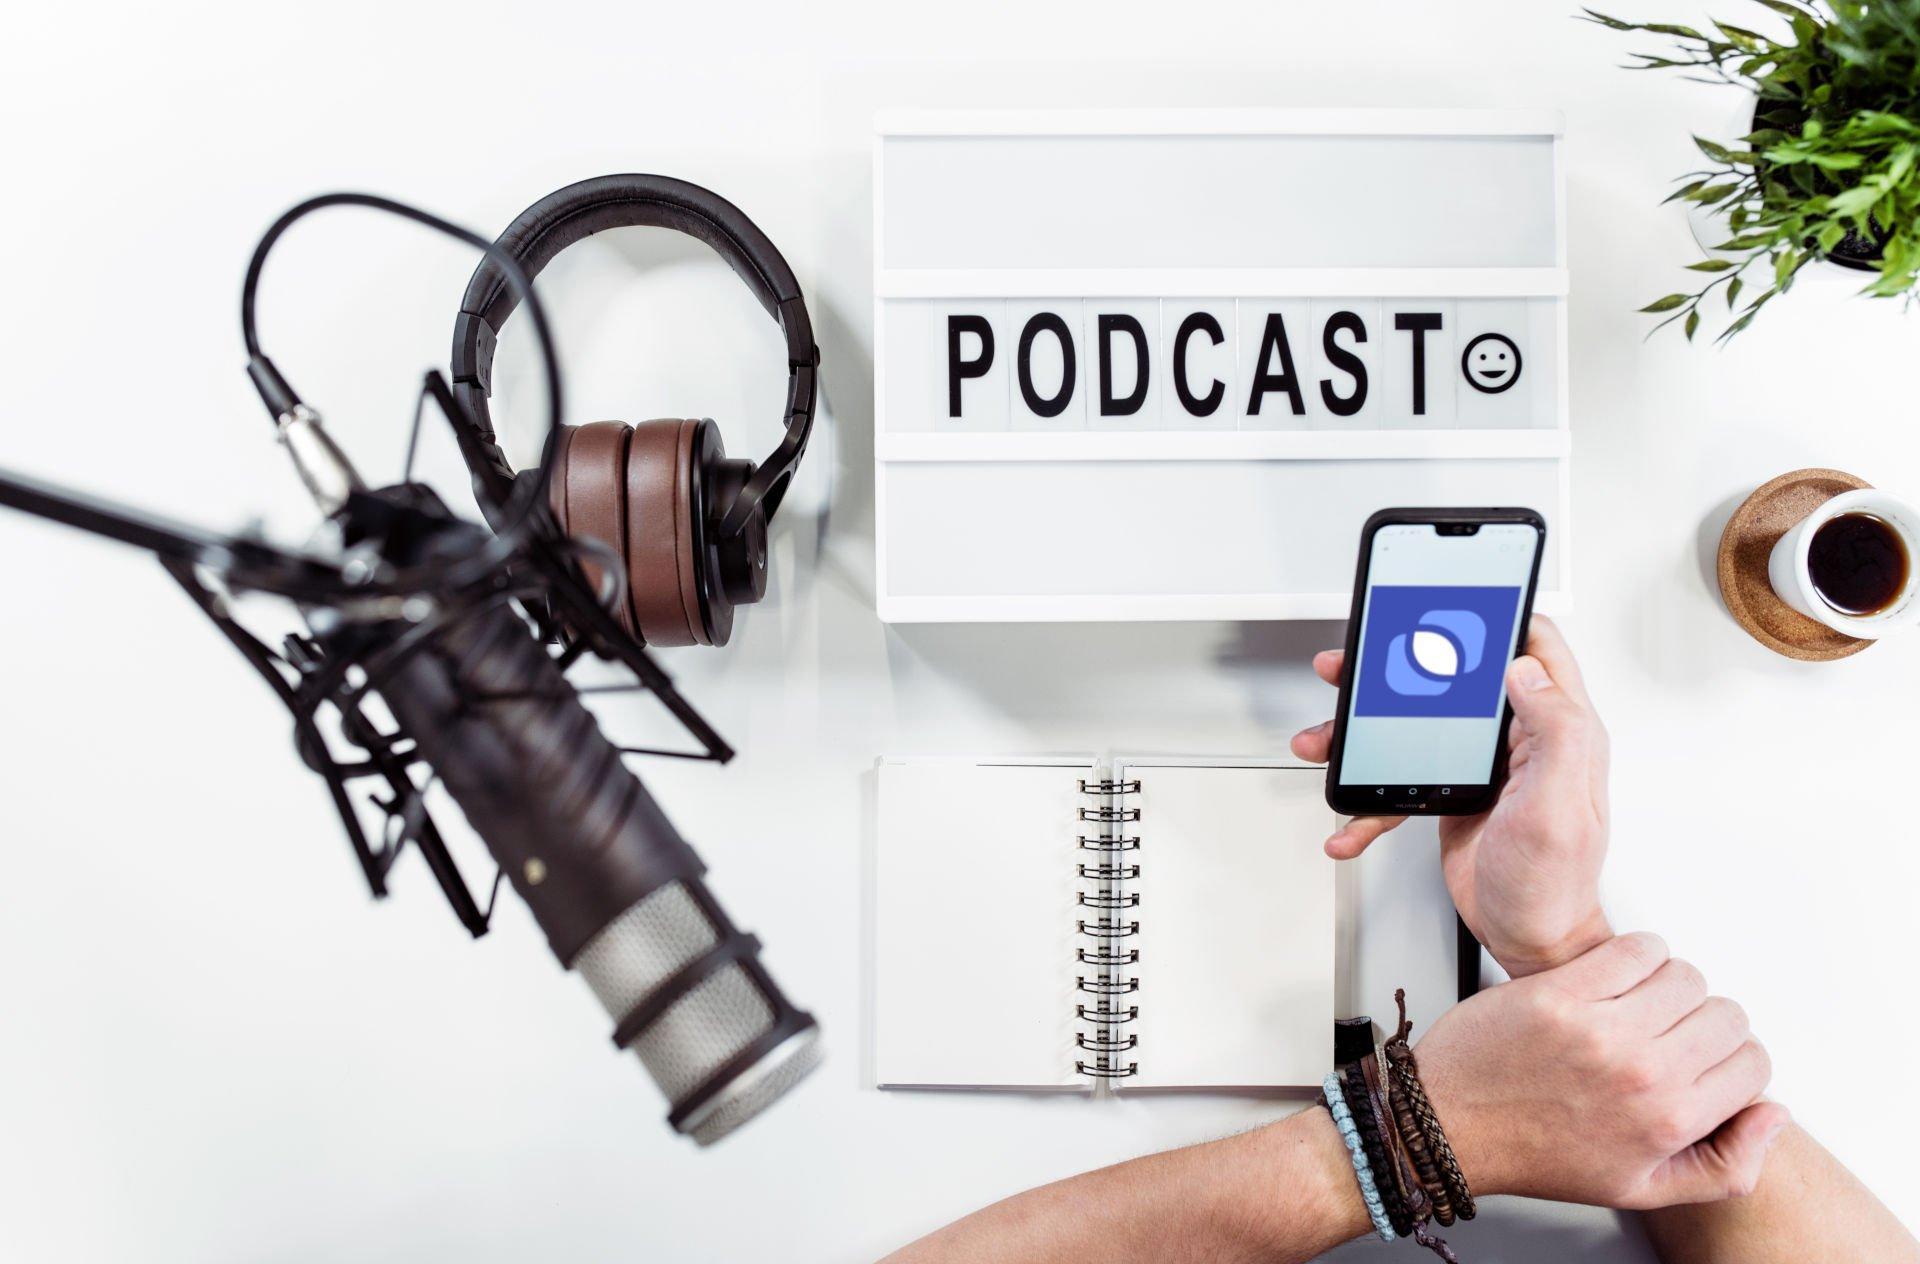 carabello-podcast-blog-post-max